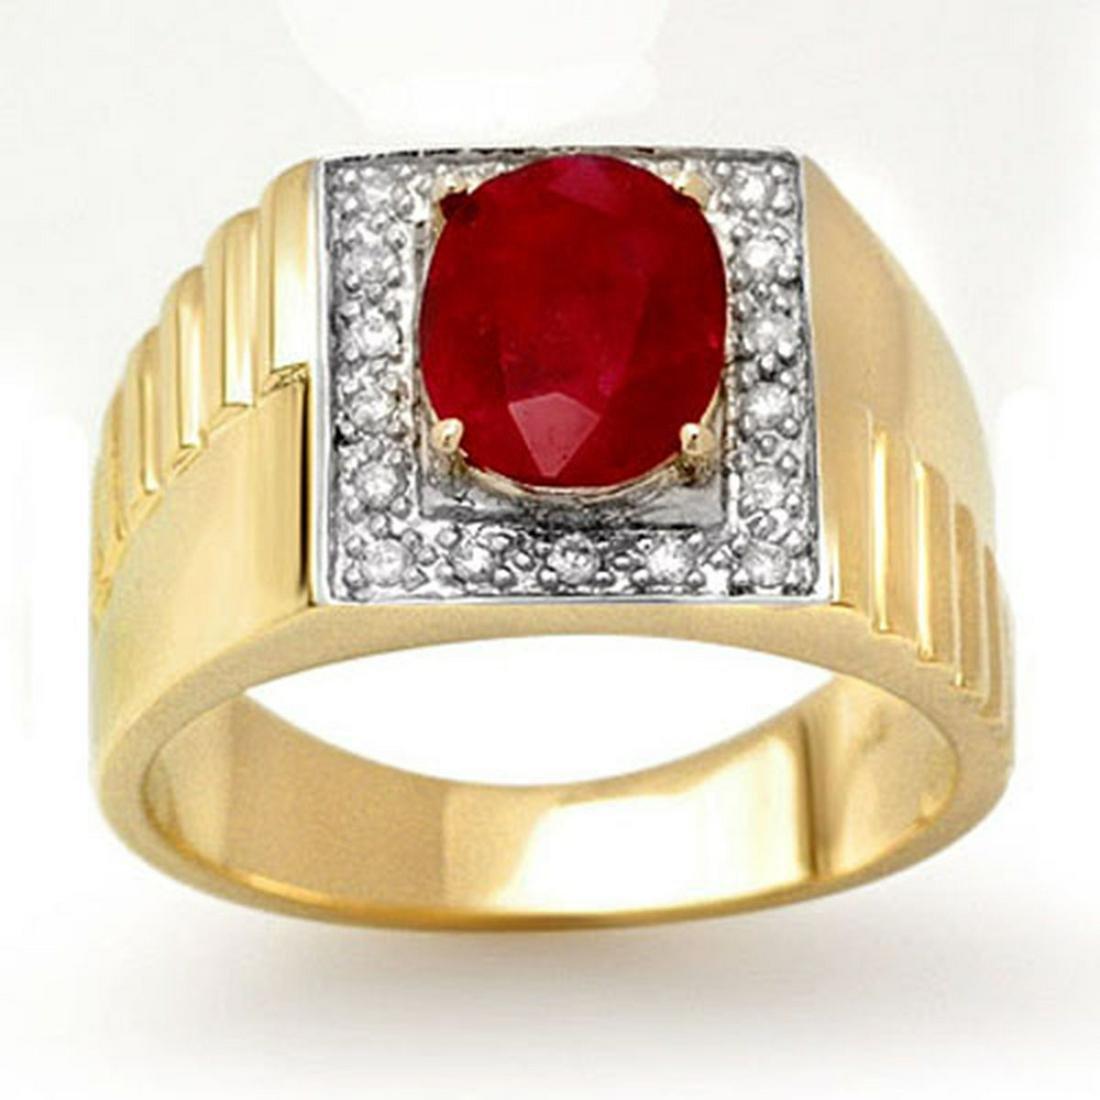 2.25 ctw Ruby & Diamond Men's Ring 10K Yellow Gold